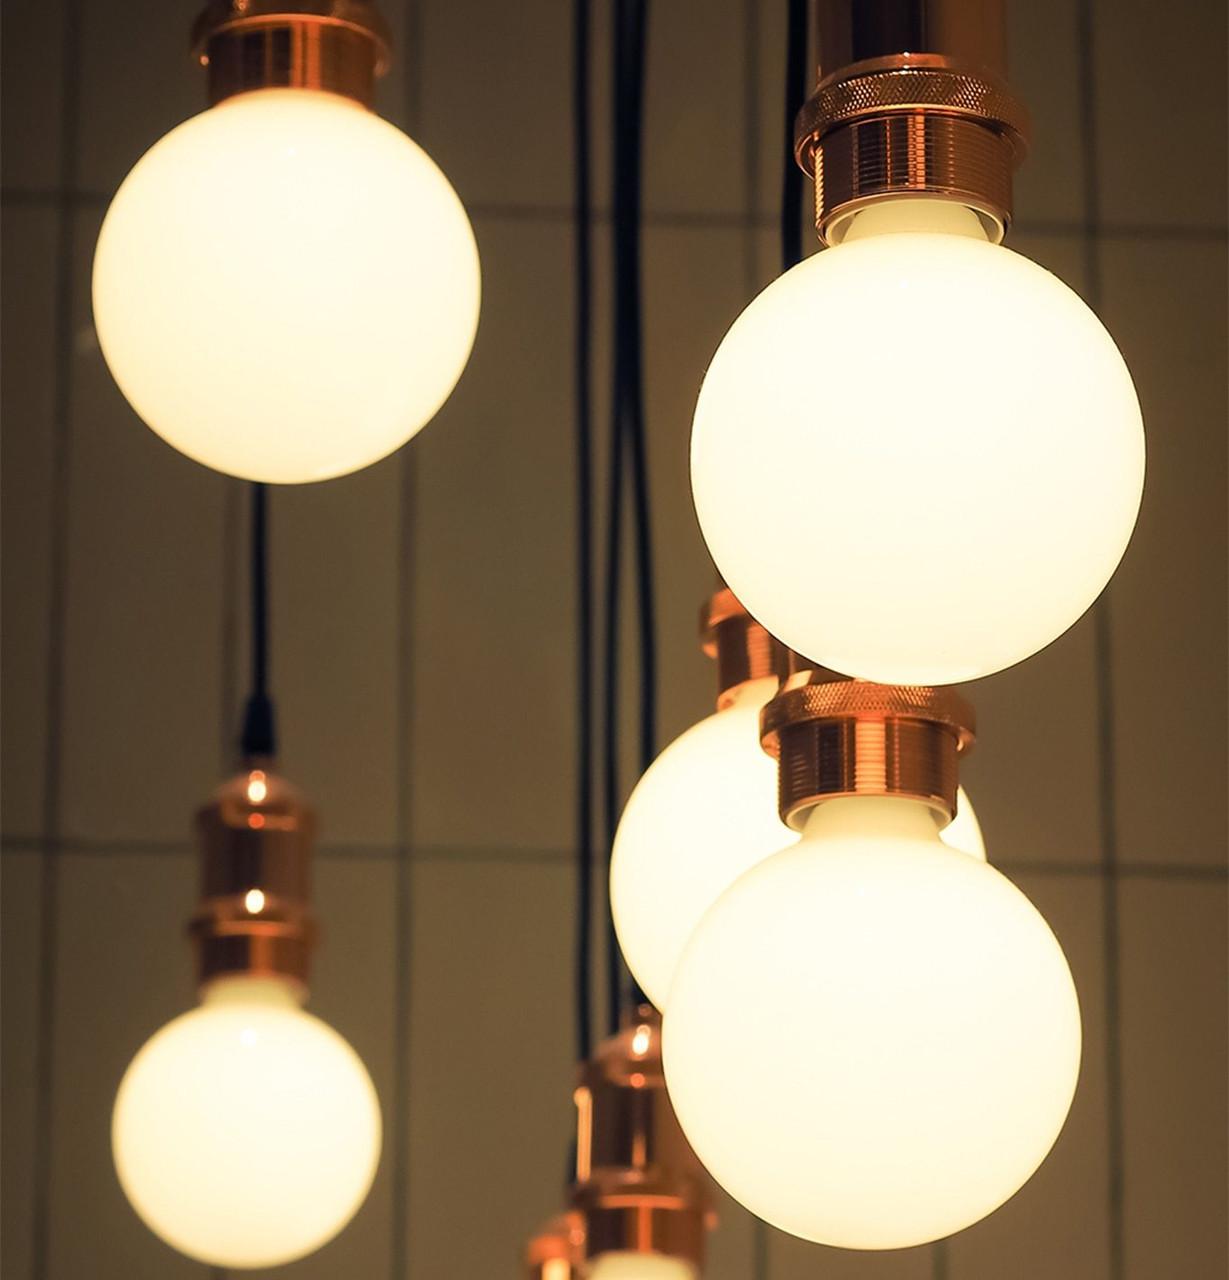 LED Dimmable Globe Filament Light Bulbs